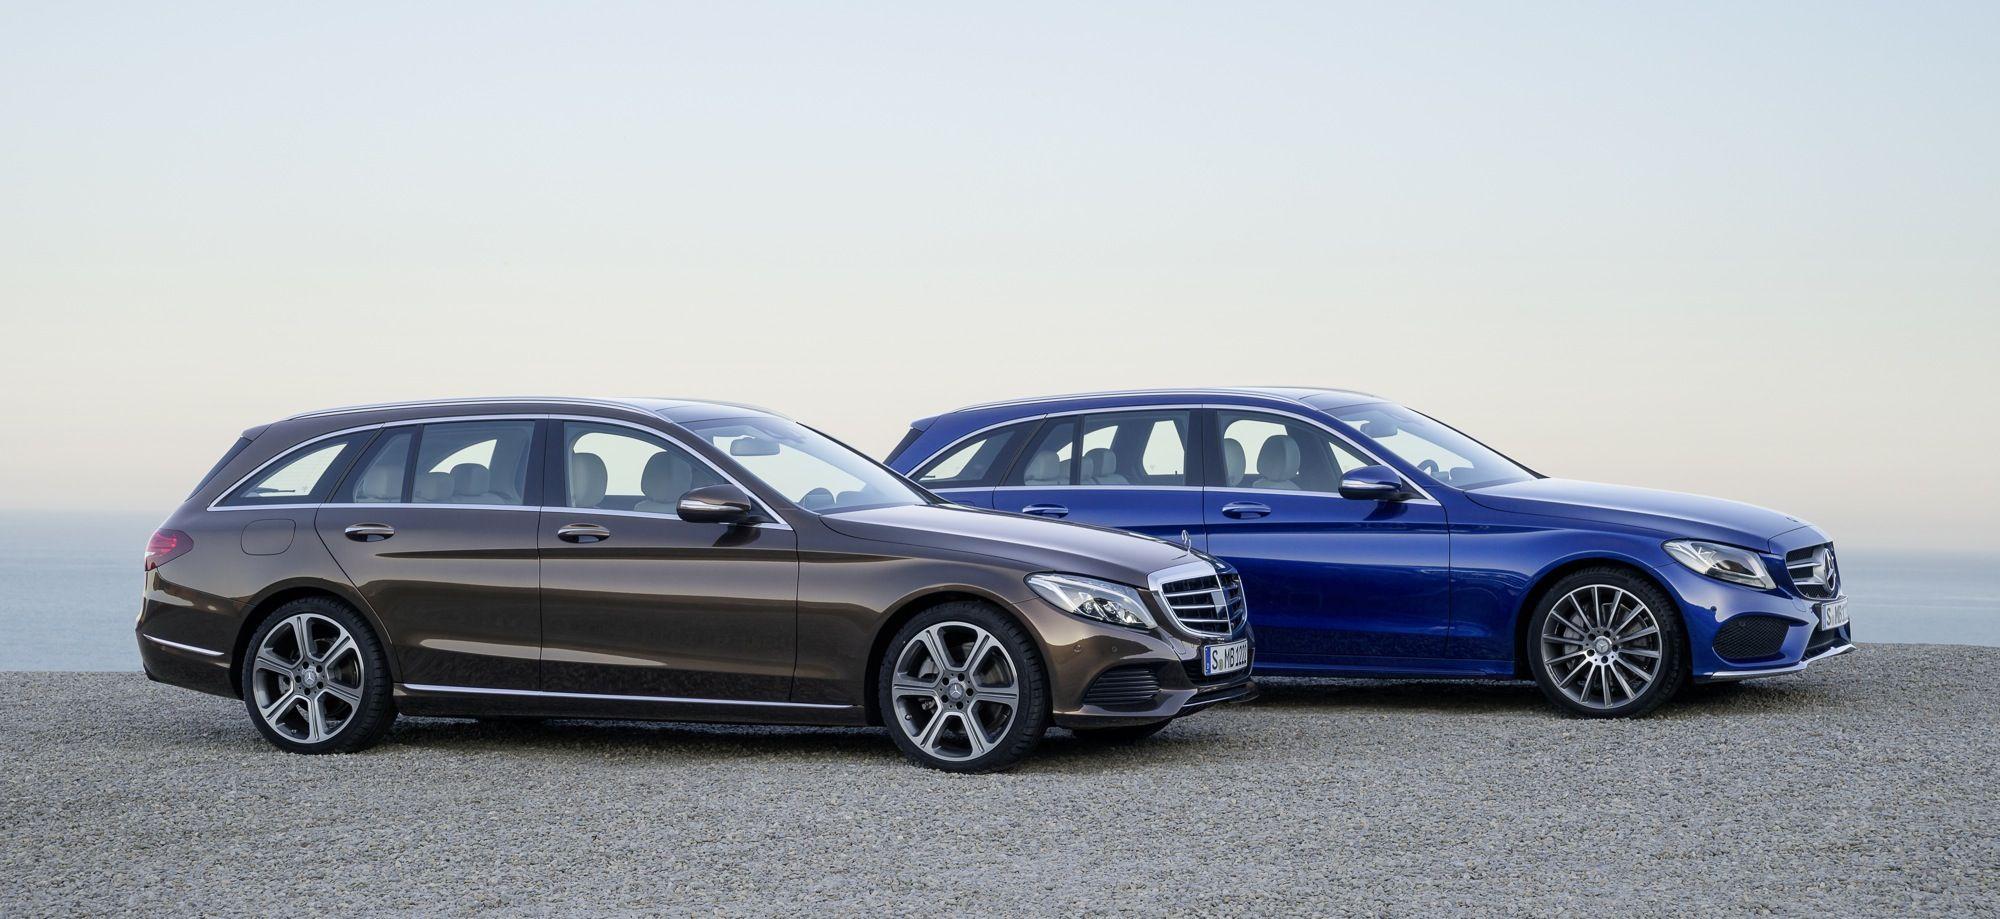 Mercedes Benz C Class Estate C300 Bluetec Hybrid And C250 Bluetec